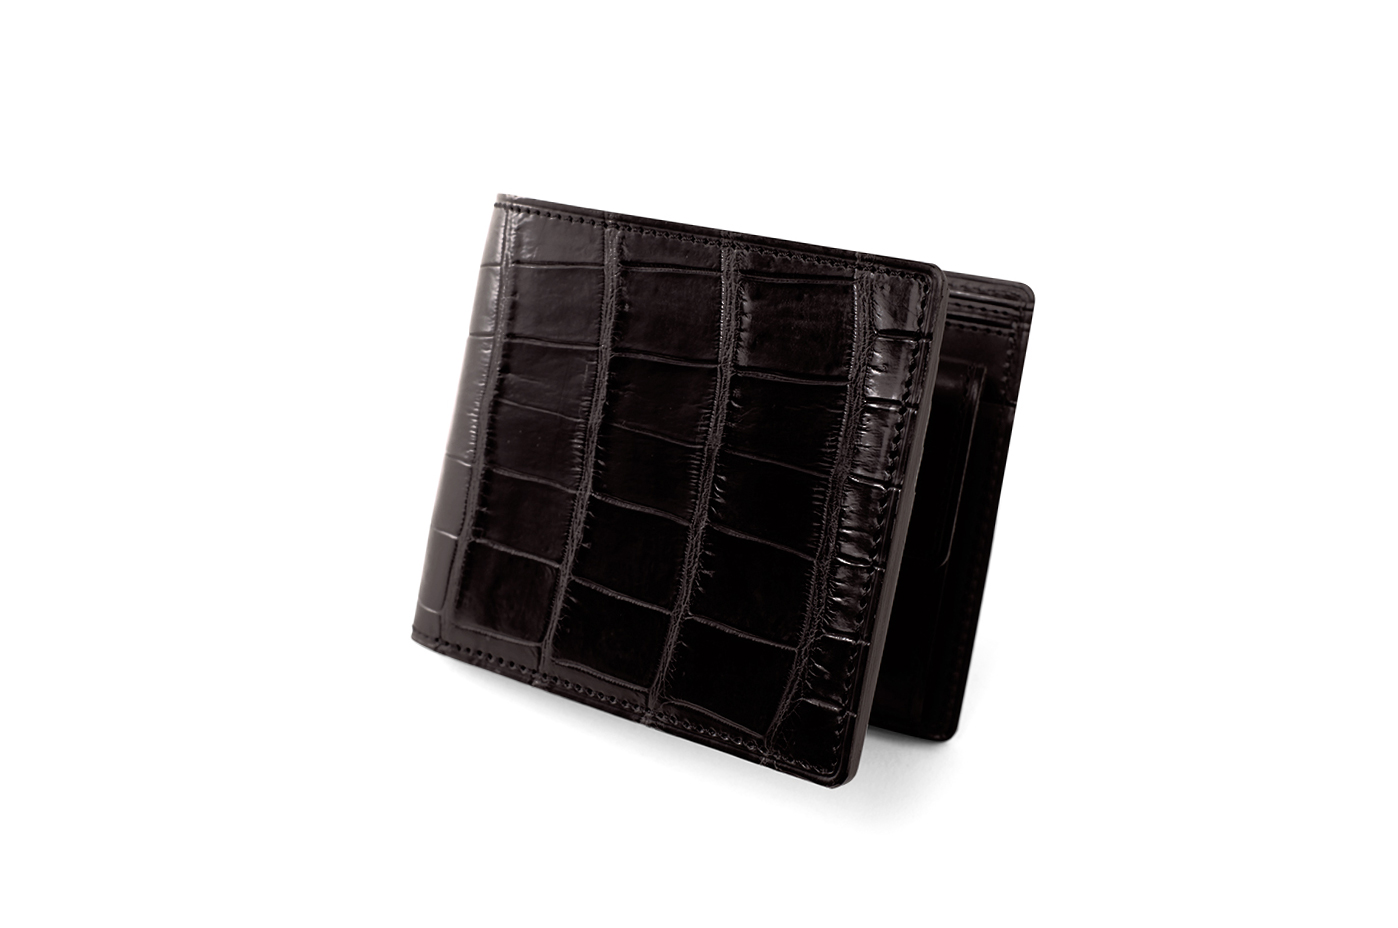 93a23b2cea8e SMALL CROCO(スモールクロコ) 小銭入れ付き二つ折り財布|最高級のメンズ ...